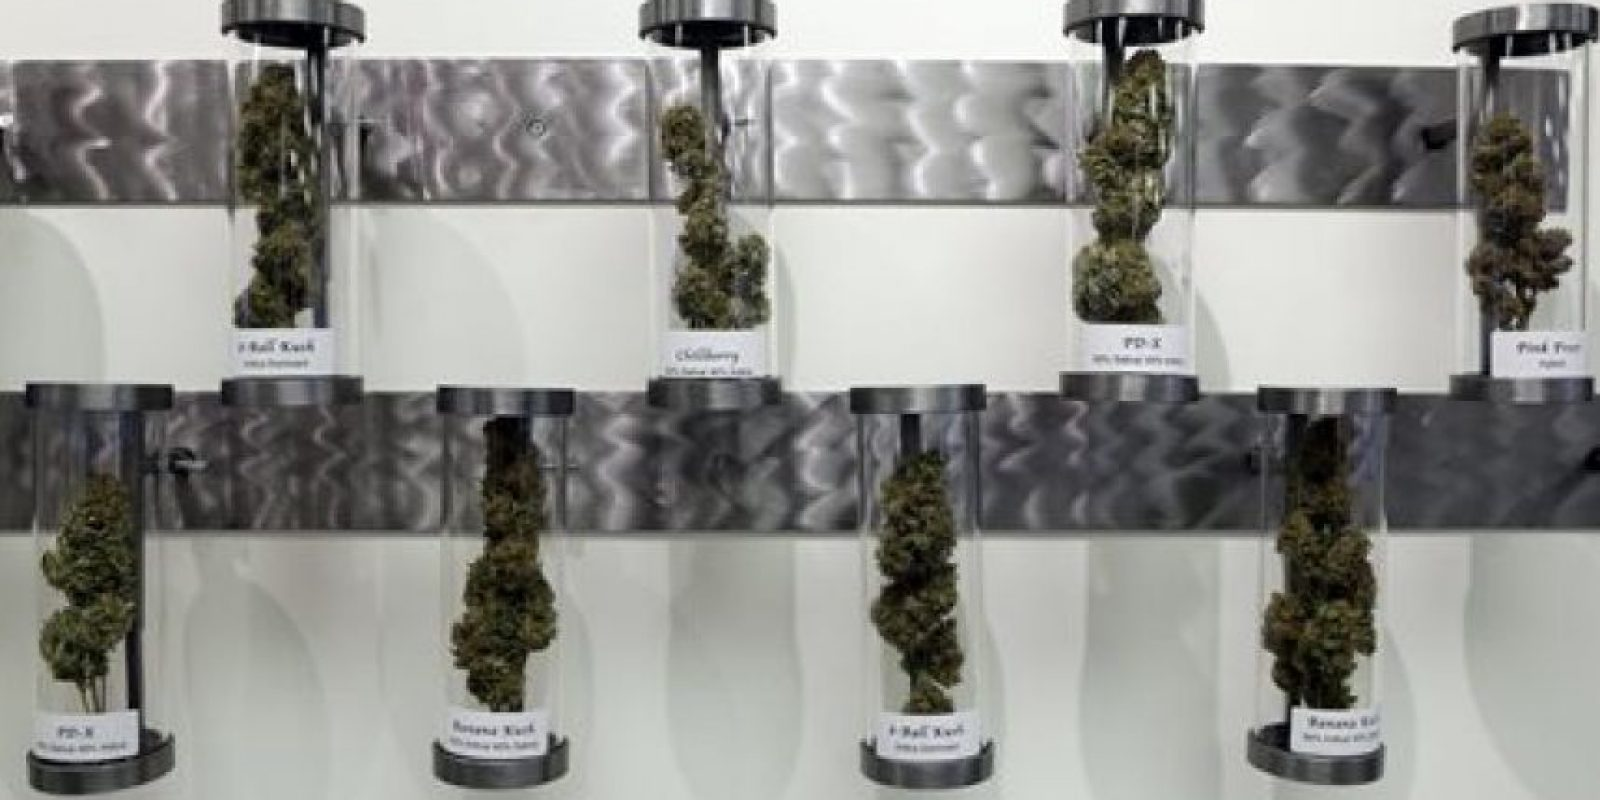 El consumo de marihuana reduce el IQ, según un estudio. Información: Mic.com Foto:AP